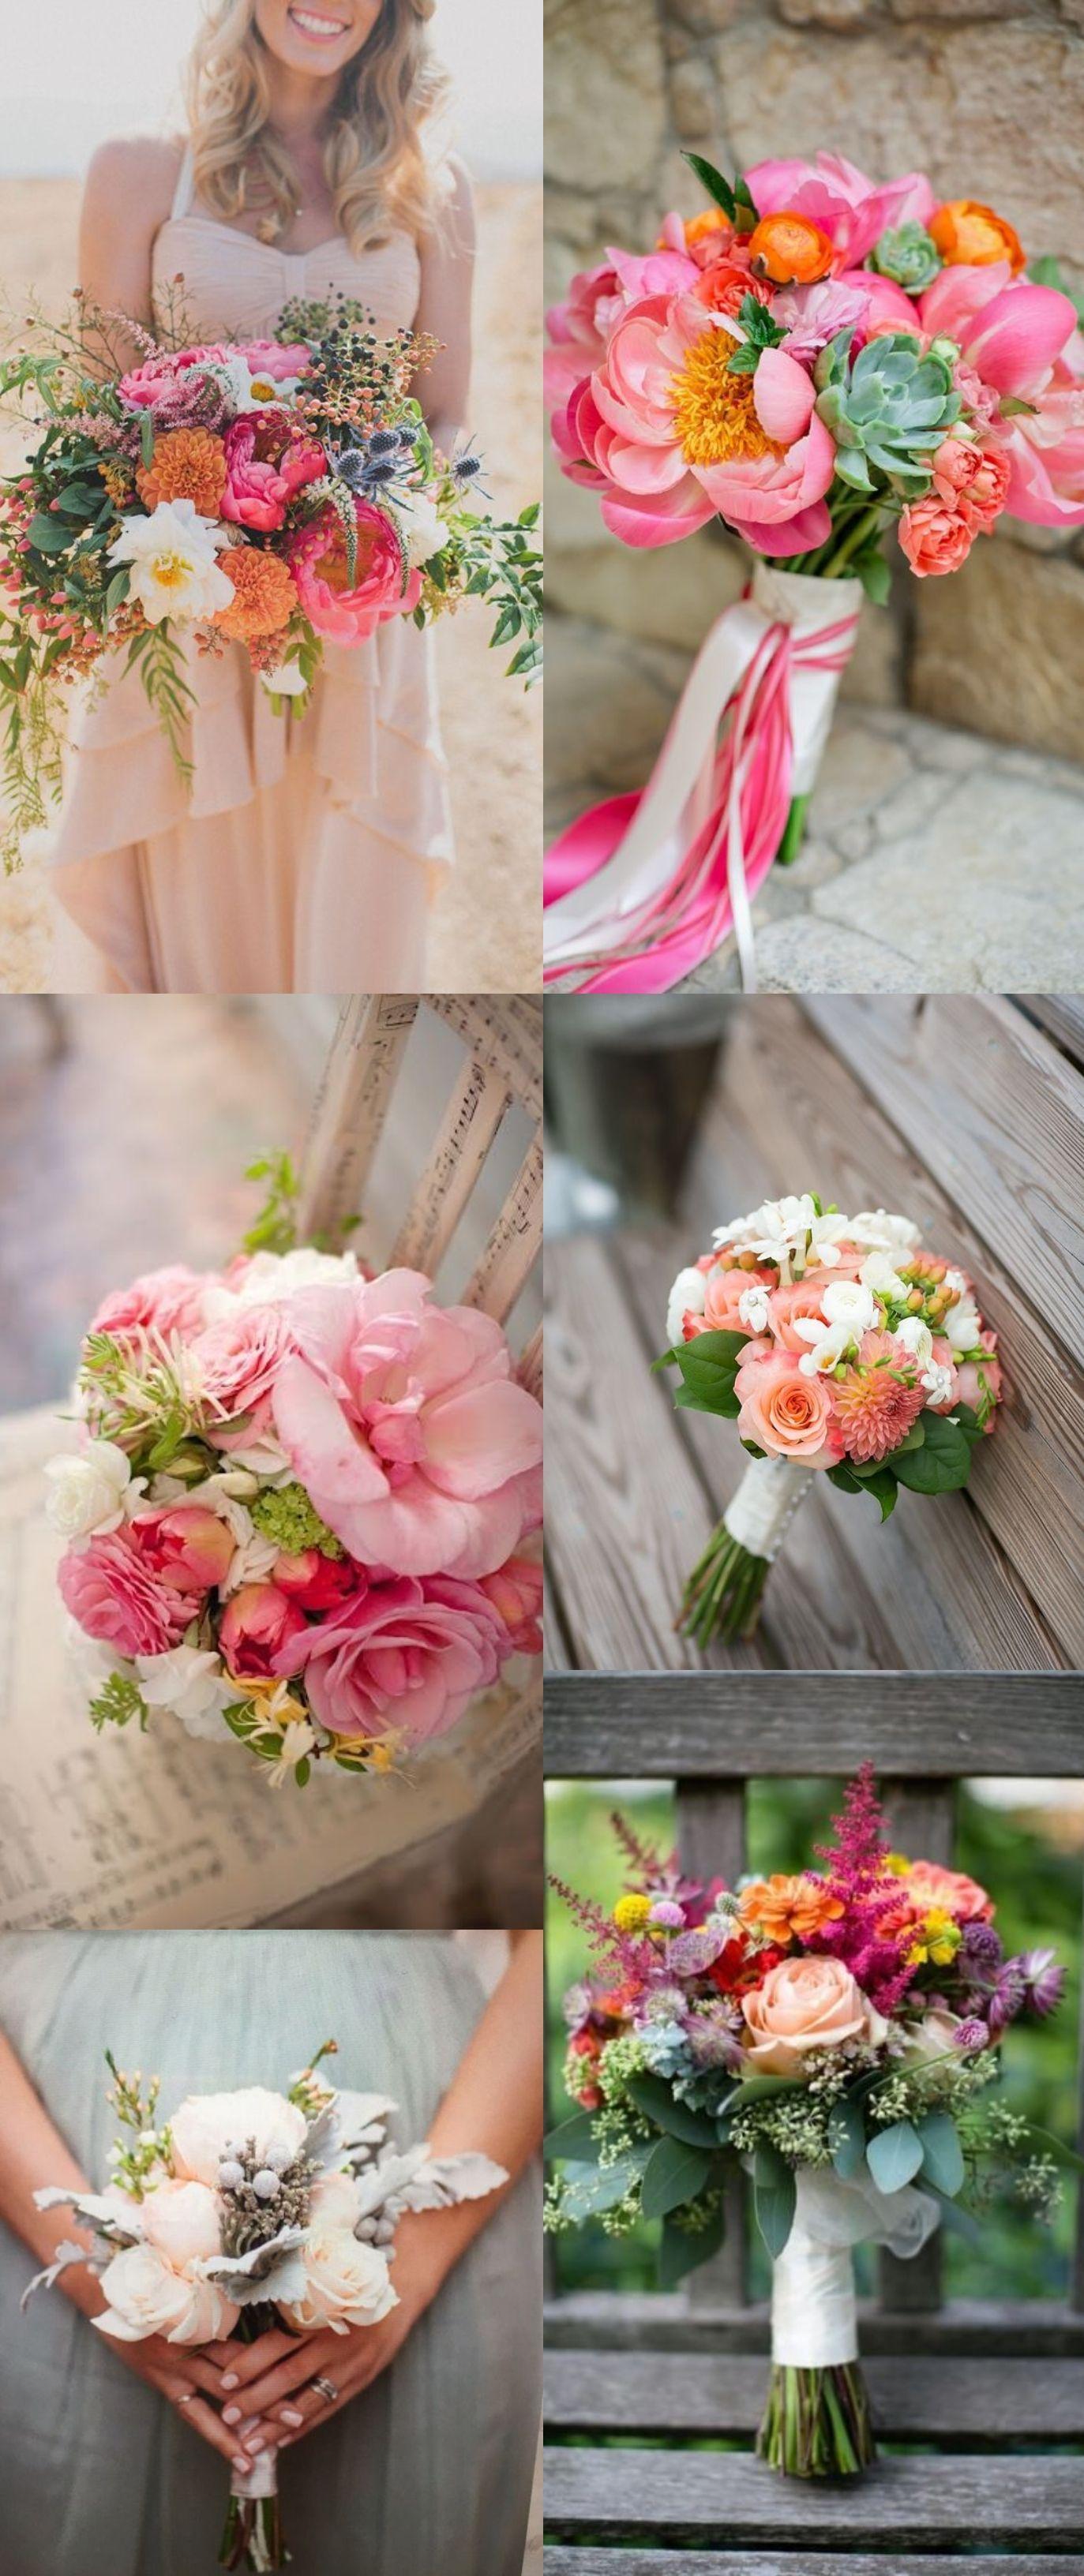 Wedding Bouquet Ideas What To Choose Wedding Bouquets Wedding